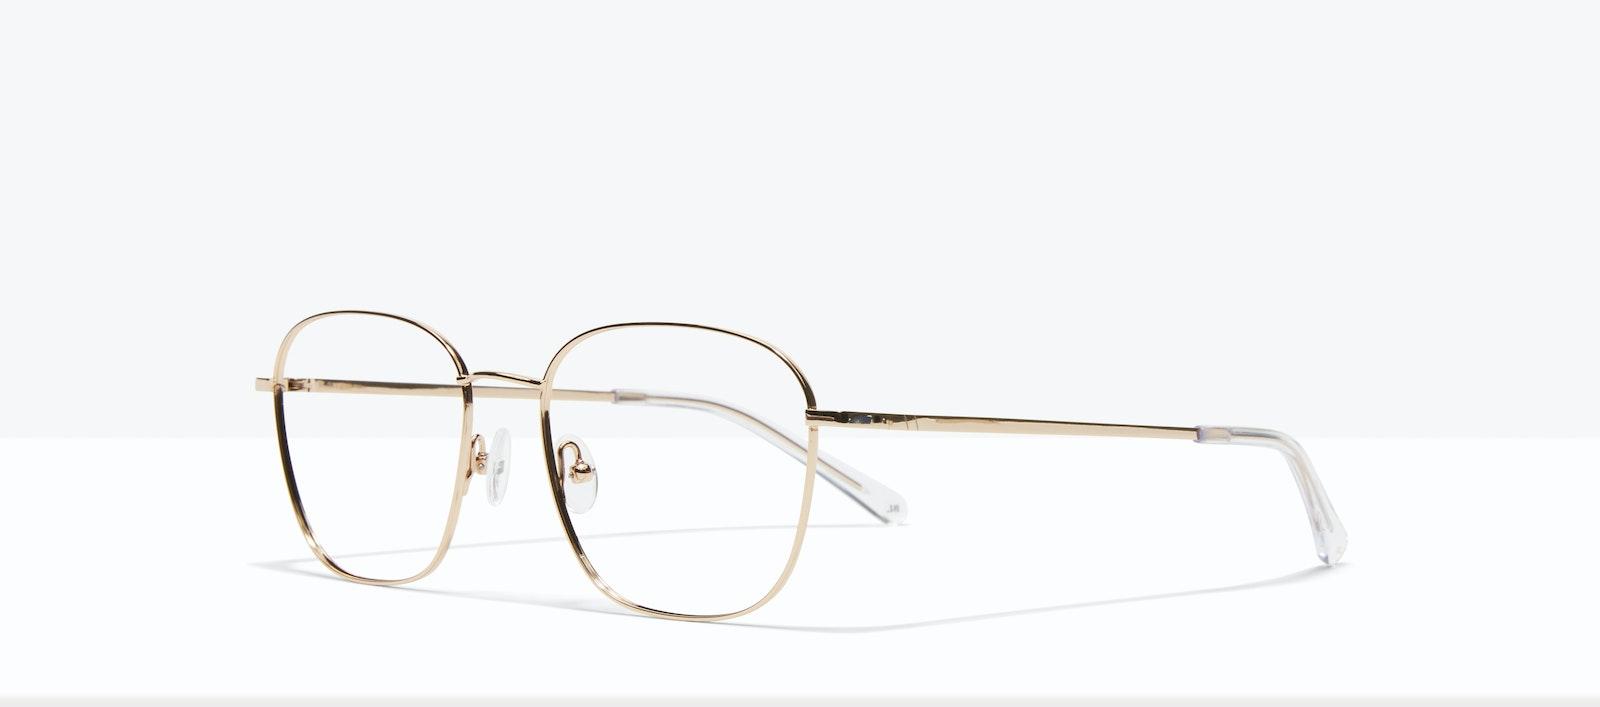 Affordable Fashion Glasses Square Eyeglasses Women Lane Gold Tilt